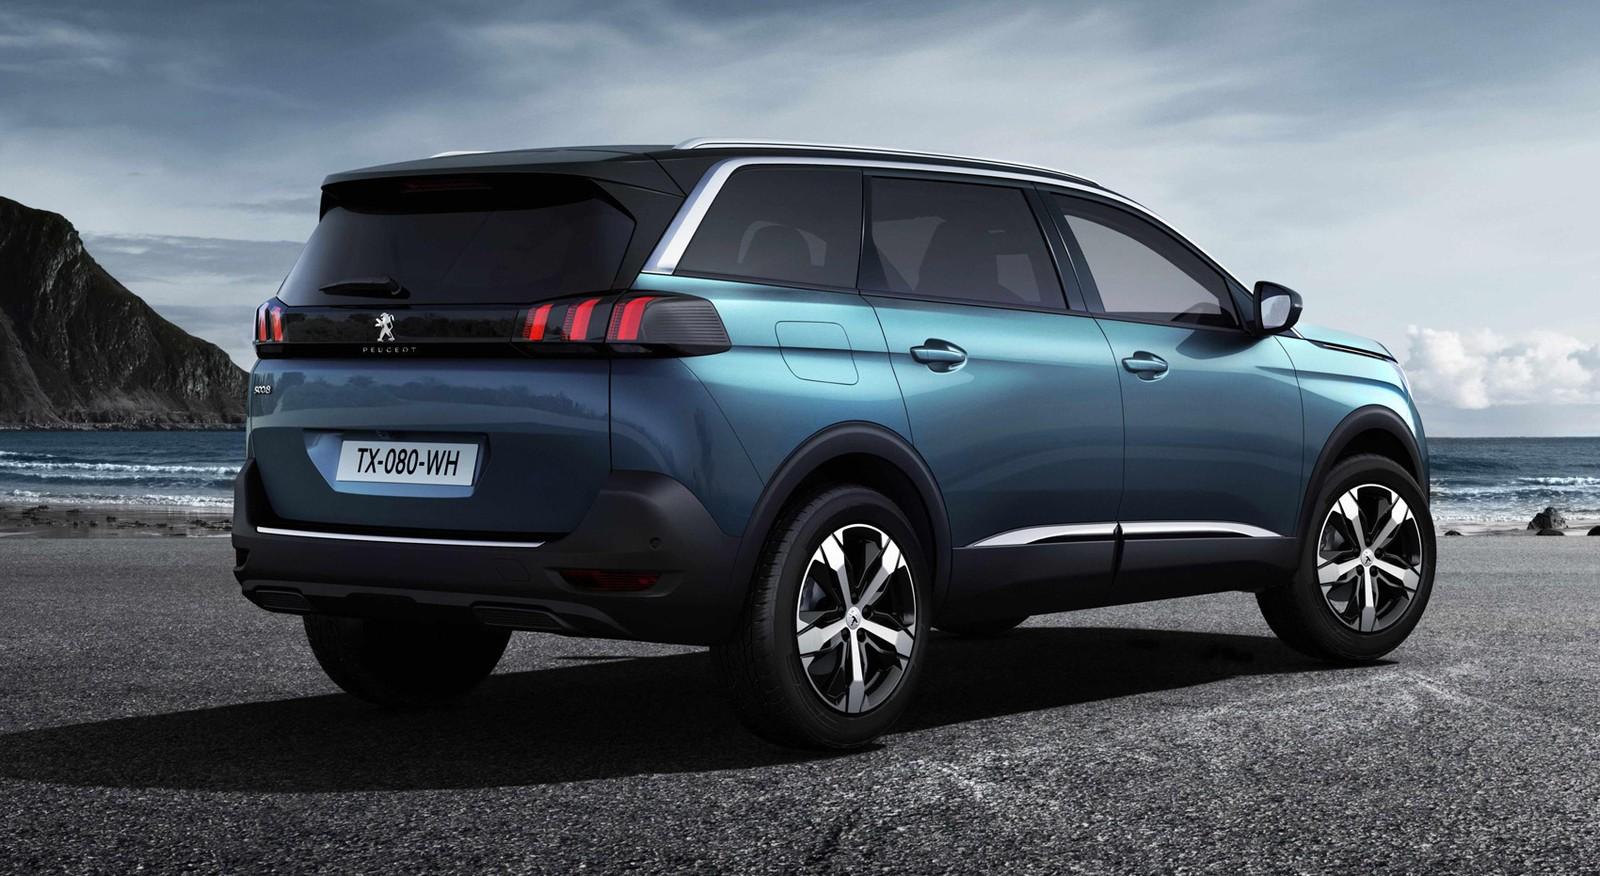 Peugeot confirma 5008 e estuda futura picape para o Brasil Peugeot_5008_suv_allure_0709styp_011